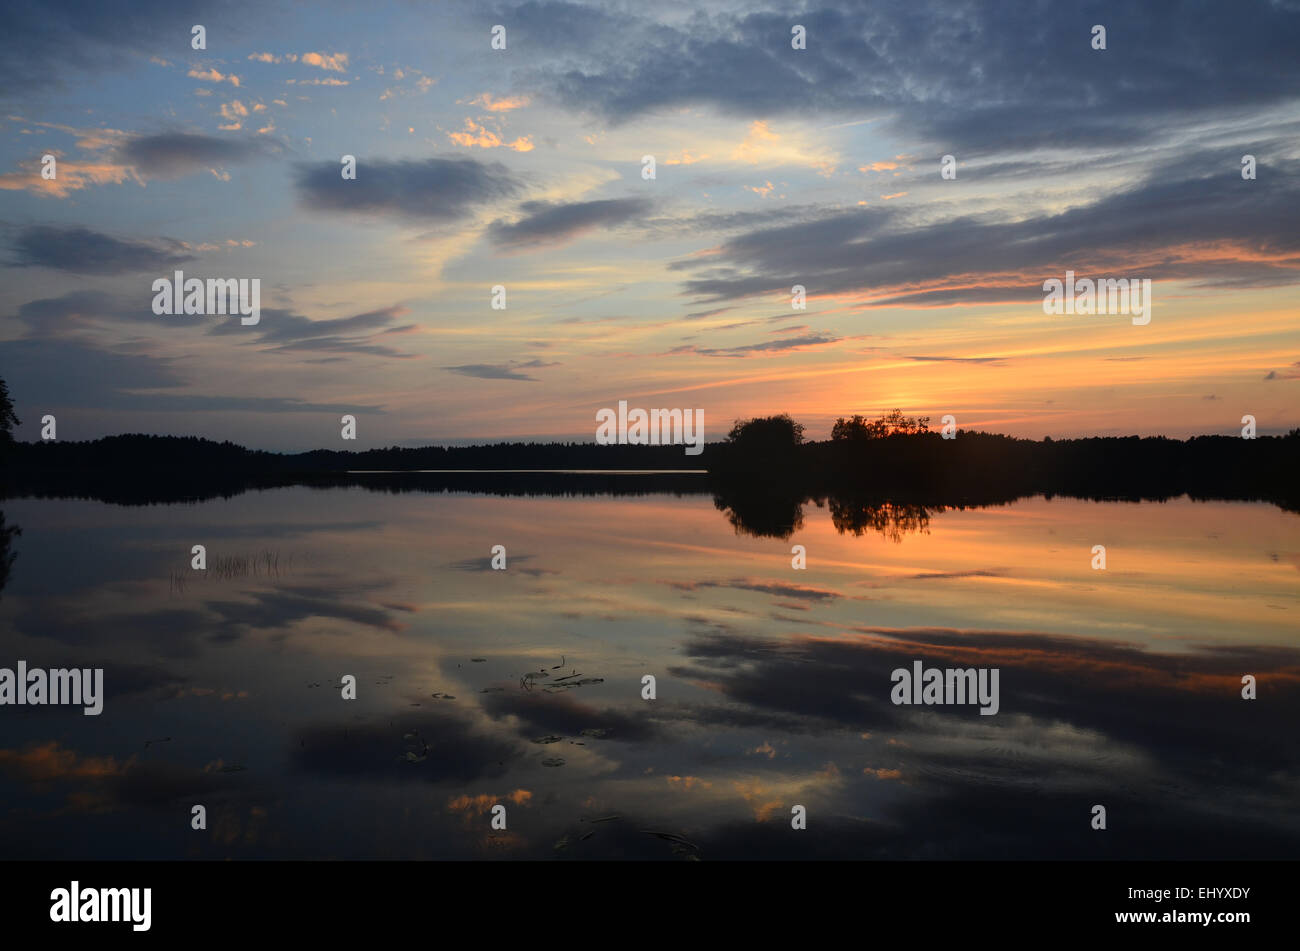 Sweden, Europe, lake, smaland, markaryd, store sjö, island, isle, summer, sundown, sunset, Stock Photo